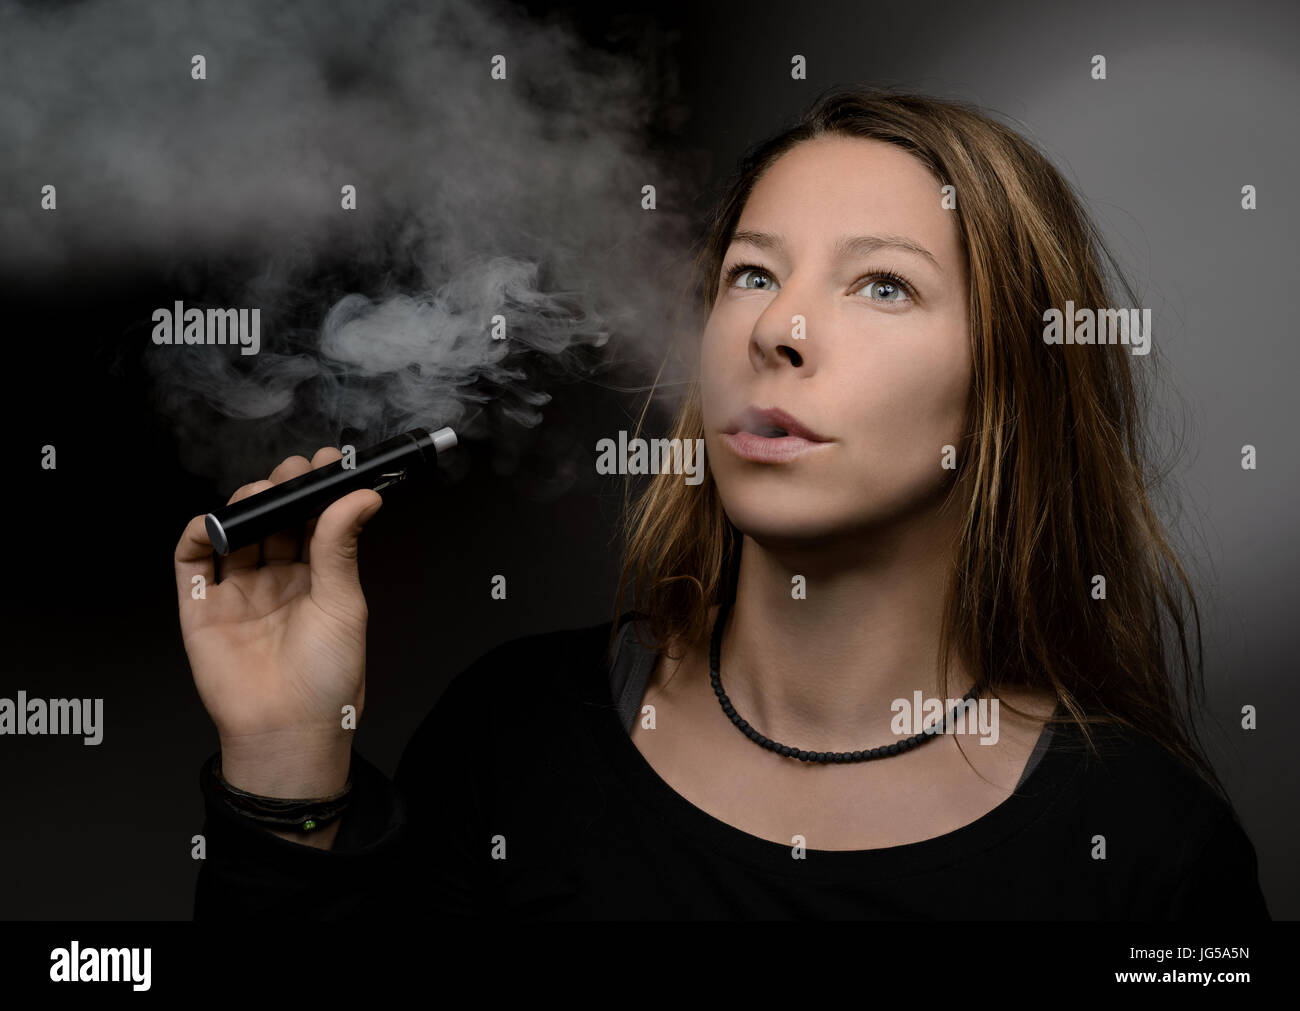 Woman smoking an electro cigarette - Stock Image